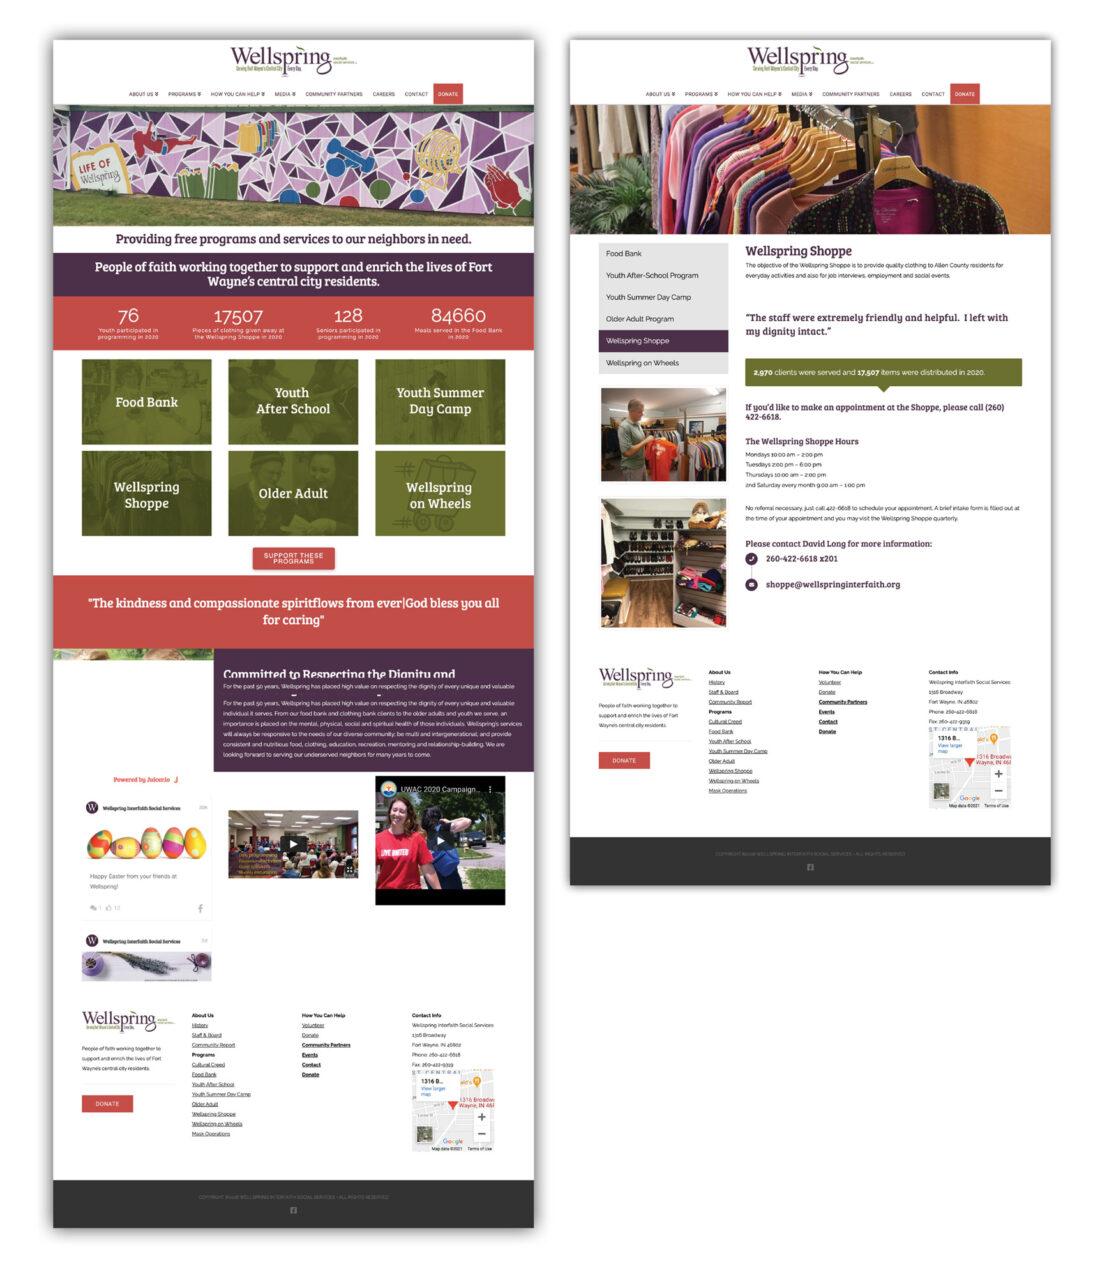 wellspring interfaith social services website design